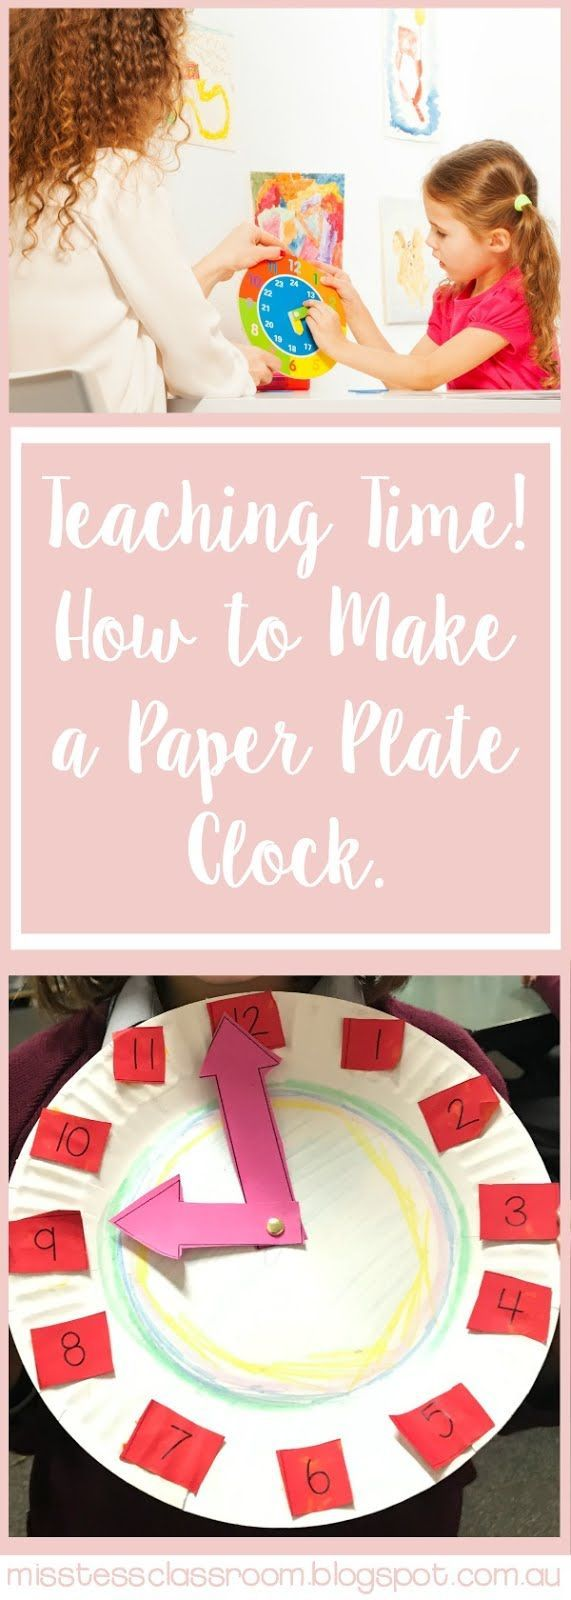 How to Make a Quick Paper Plate Clock - includes F R E E template!